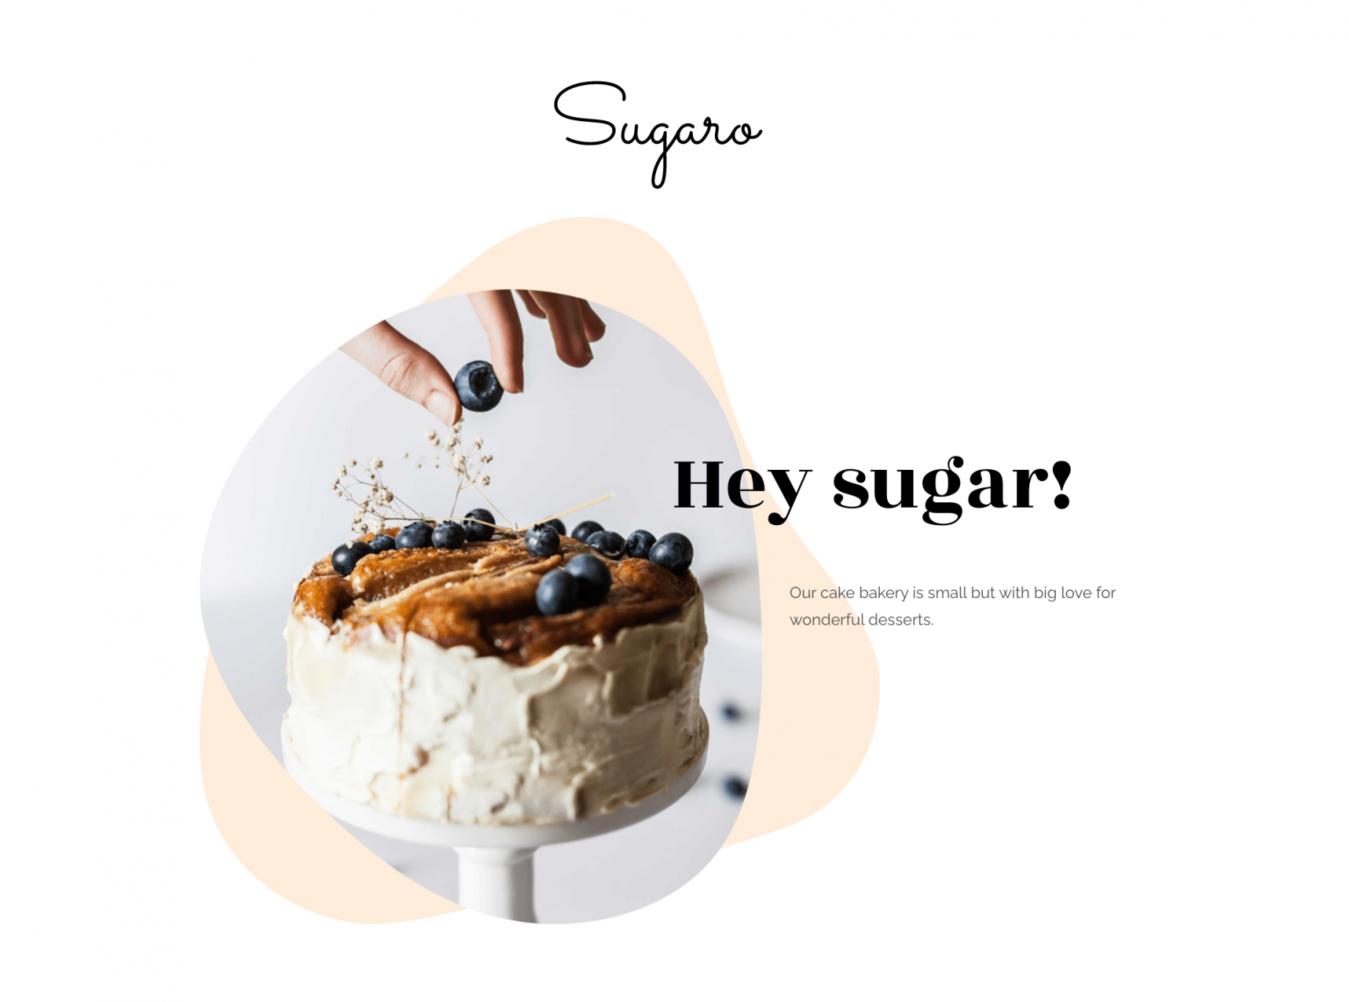 Zyro Sugaro website landing page